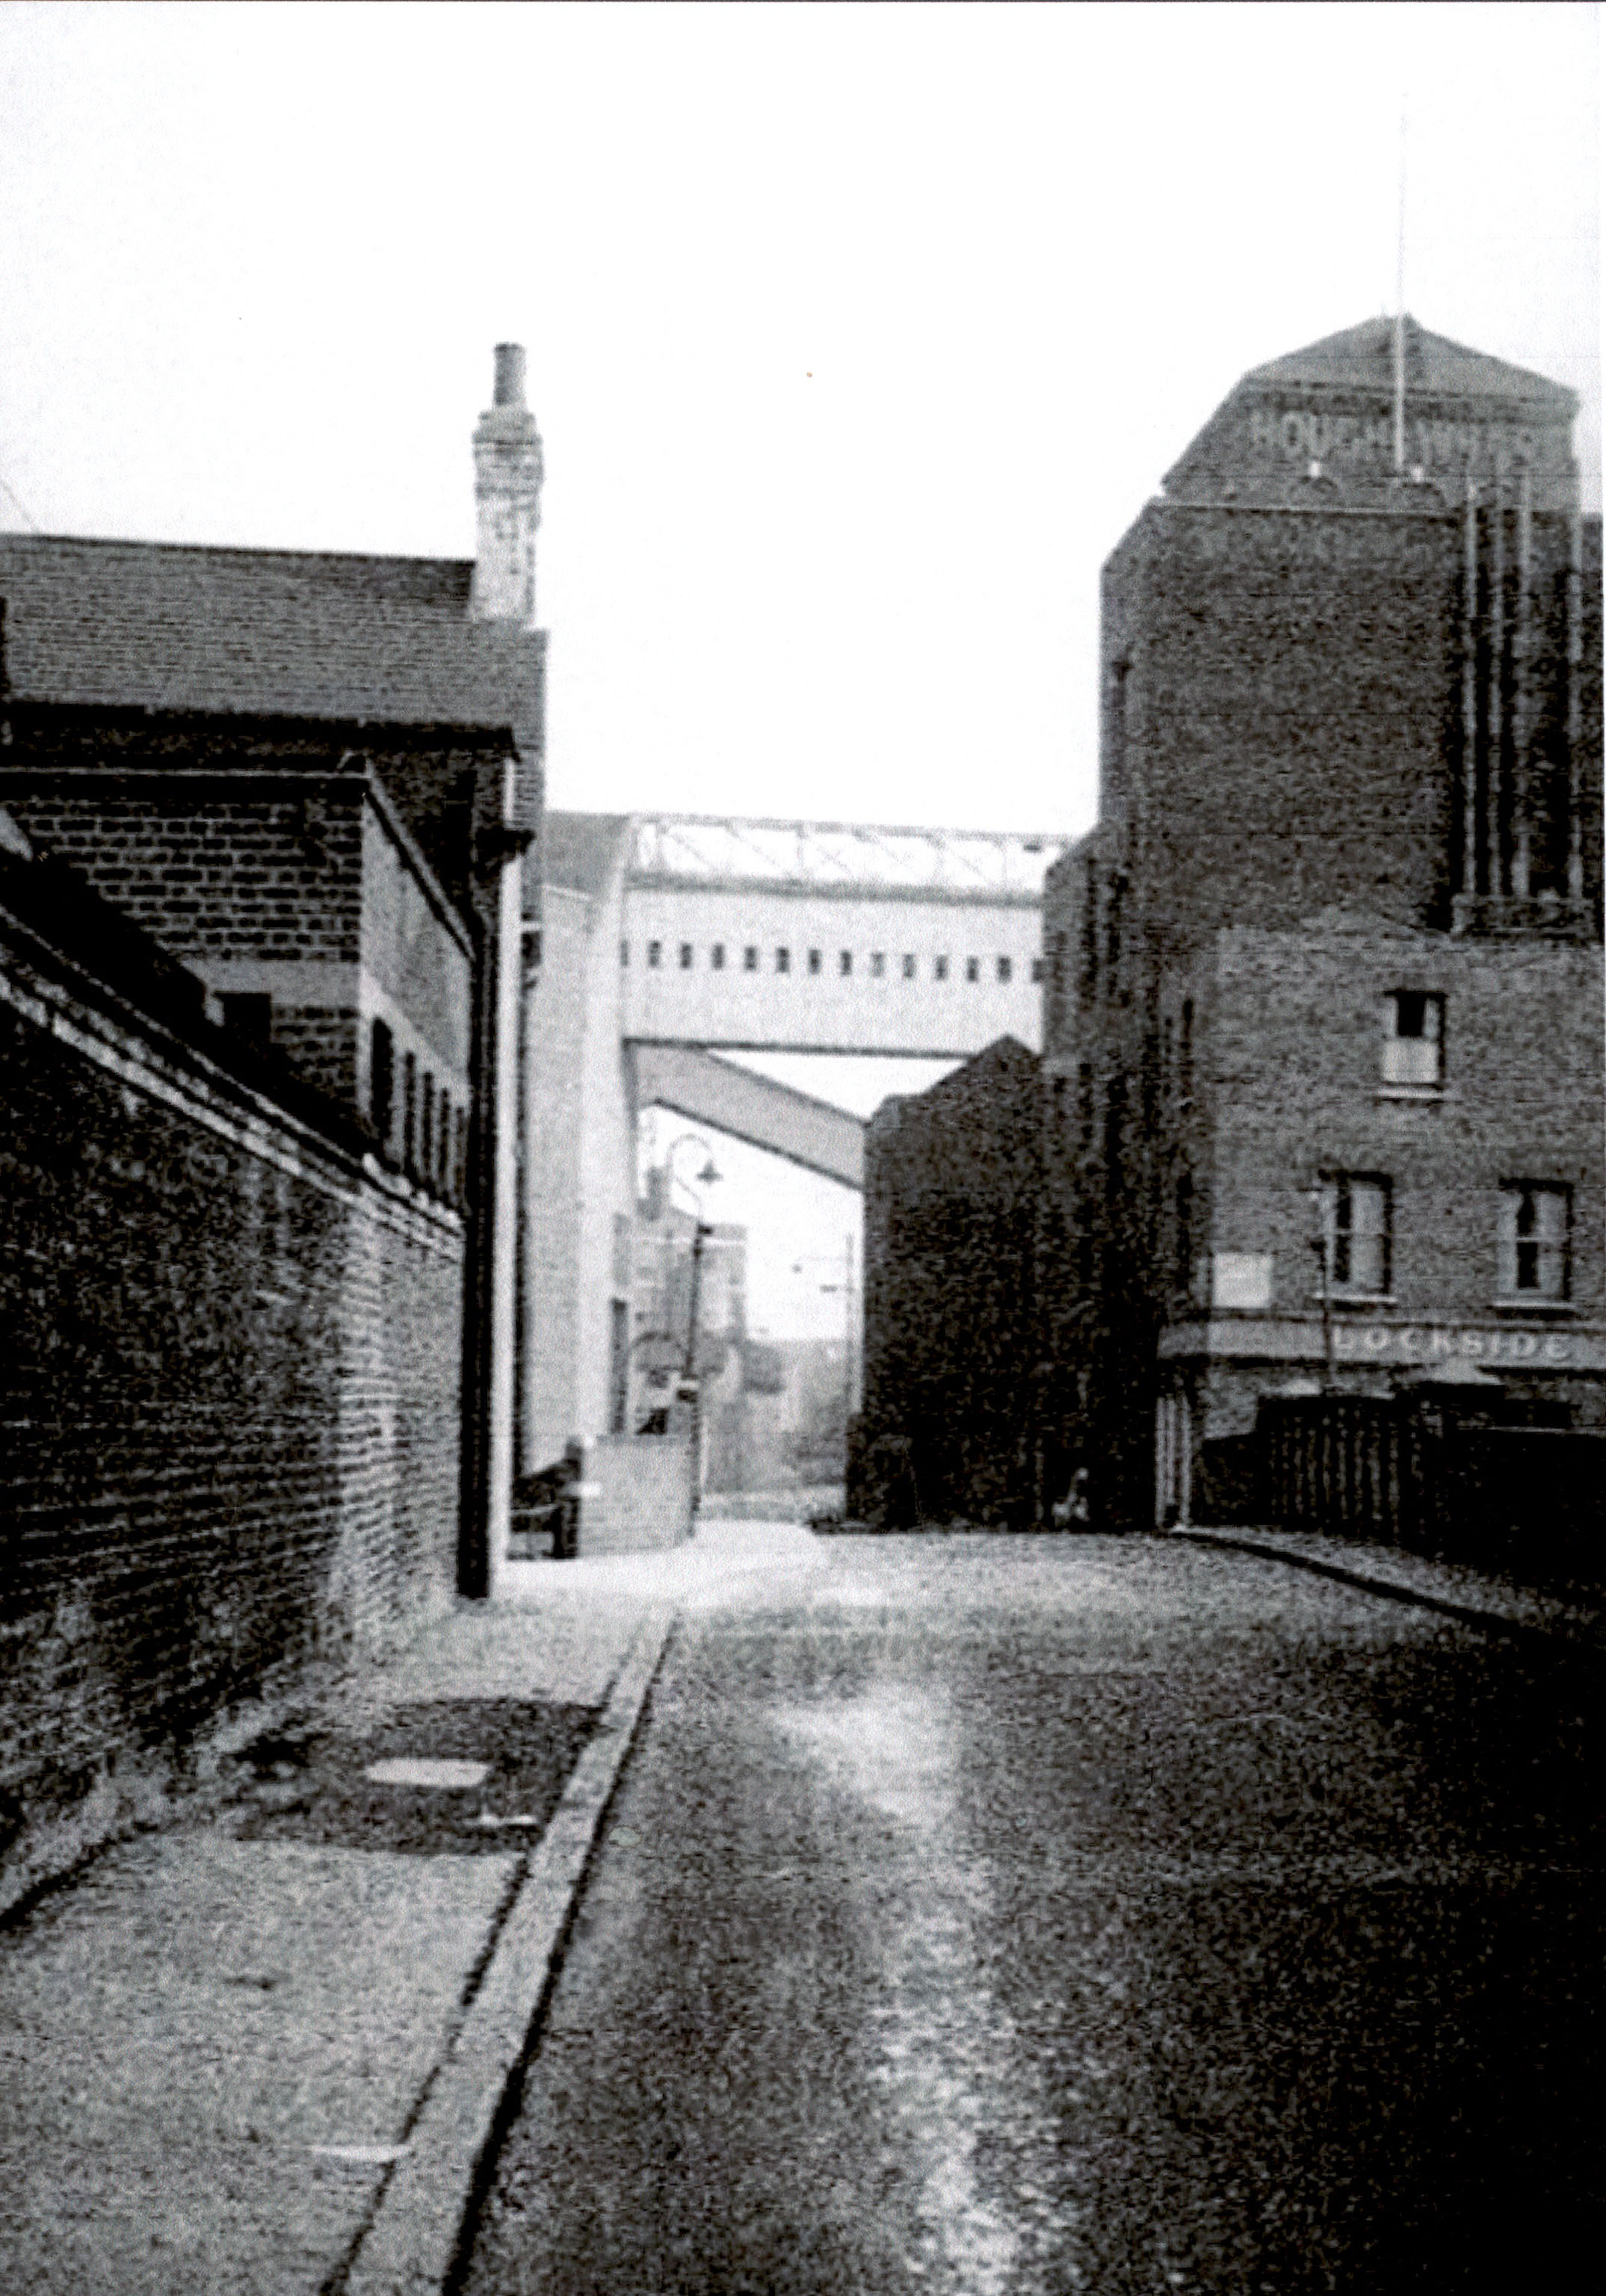 narrowstreet2.jpg